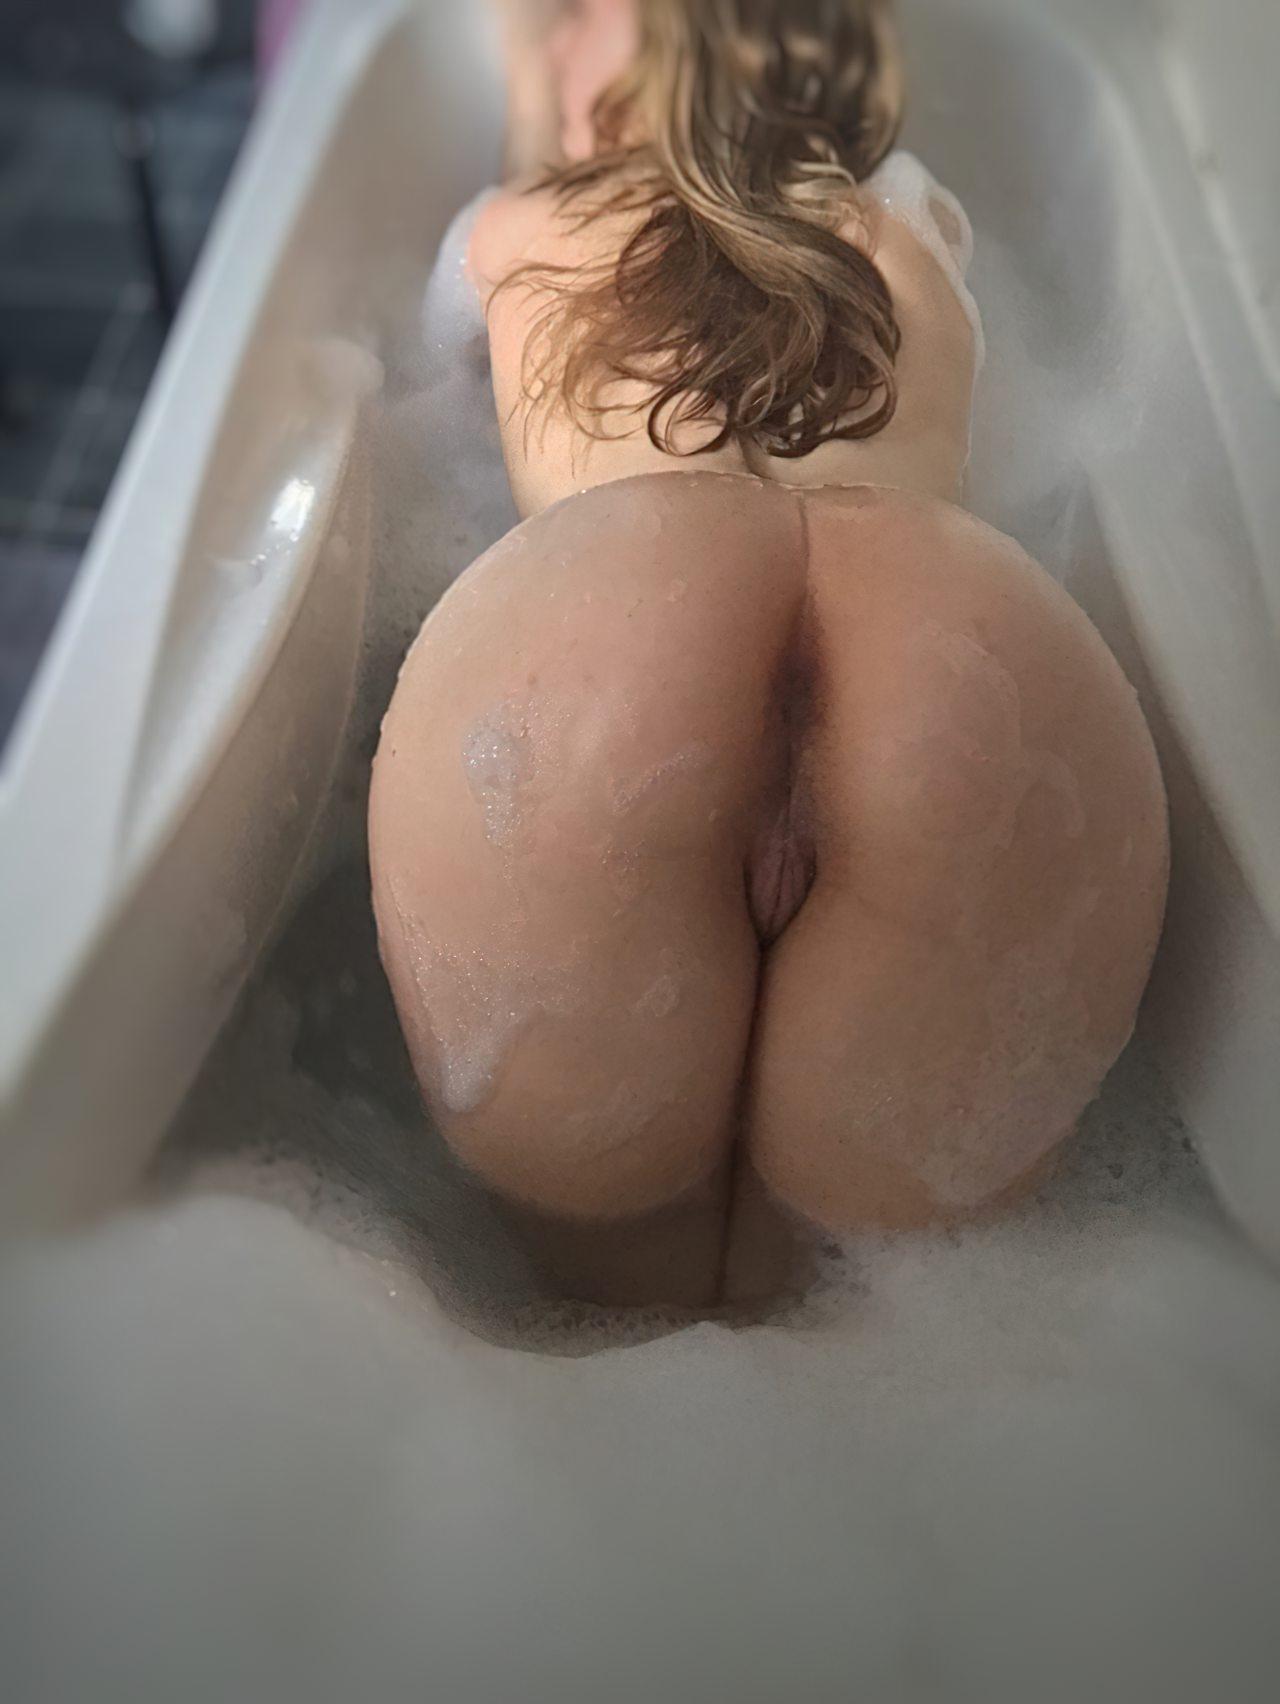 Mulheres Safadas (31)